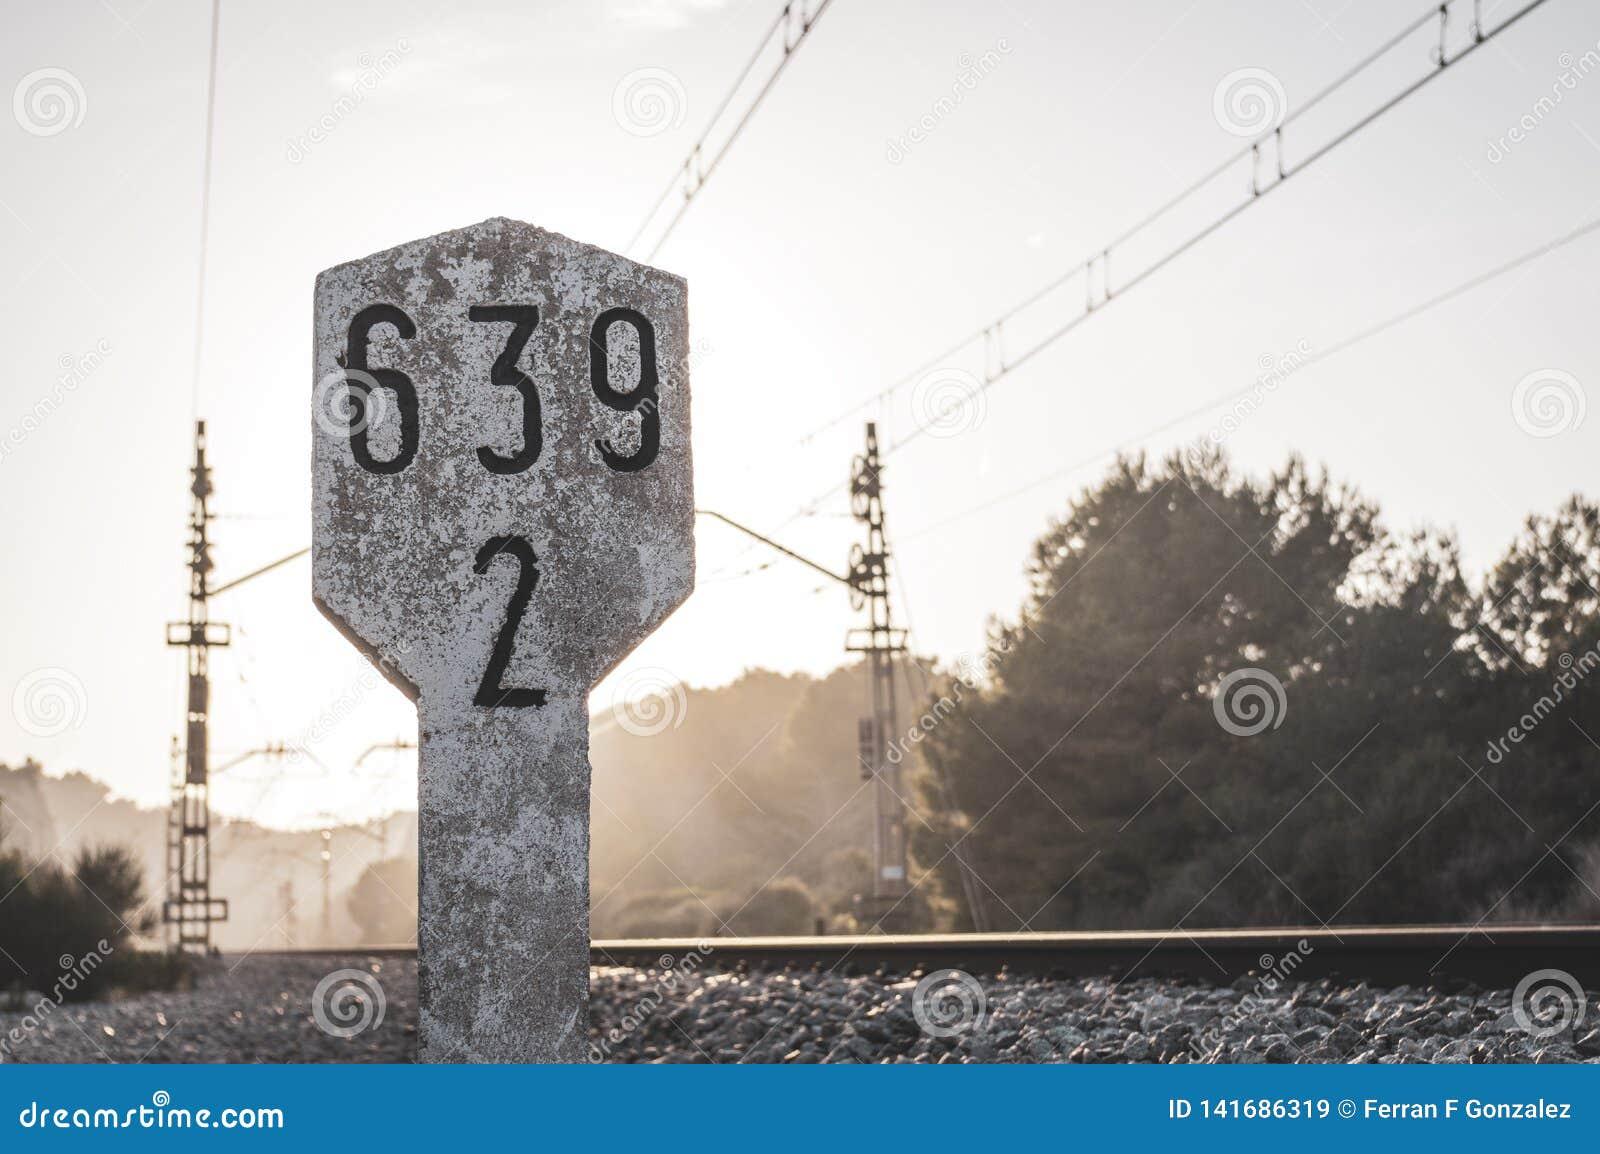 Spoorwegverkeersteken naast treinsporen met kilometric nummering in concrete teller met zonsondergang raylights